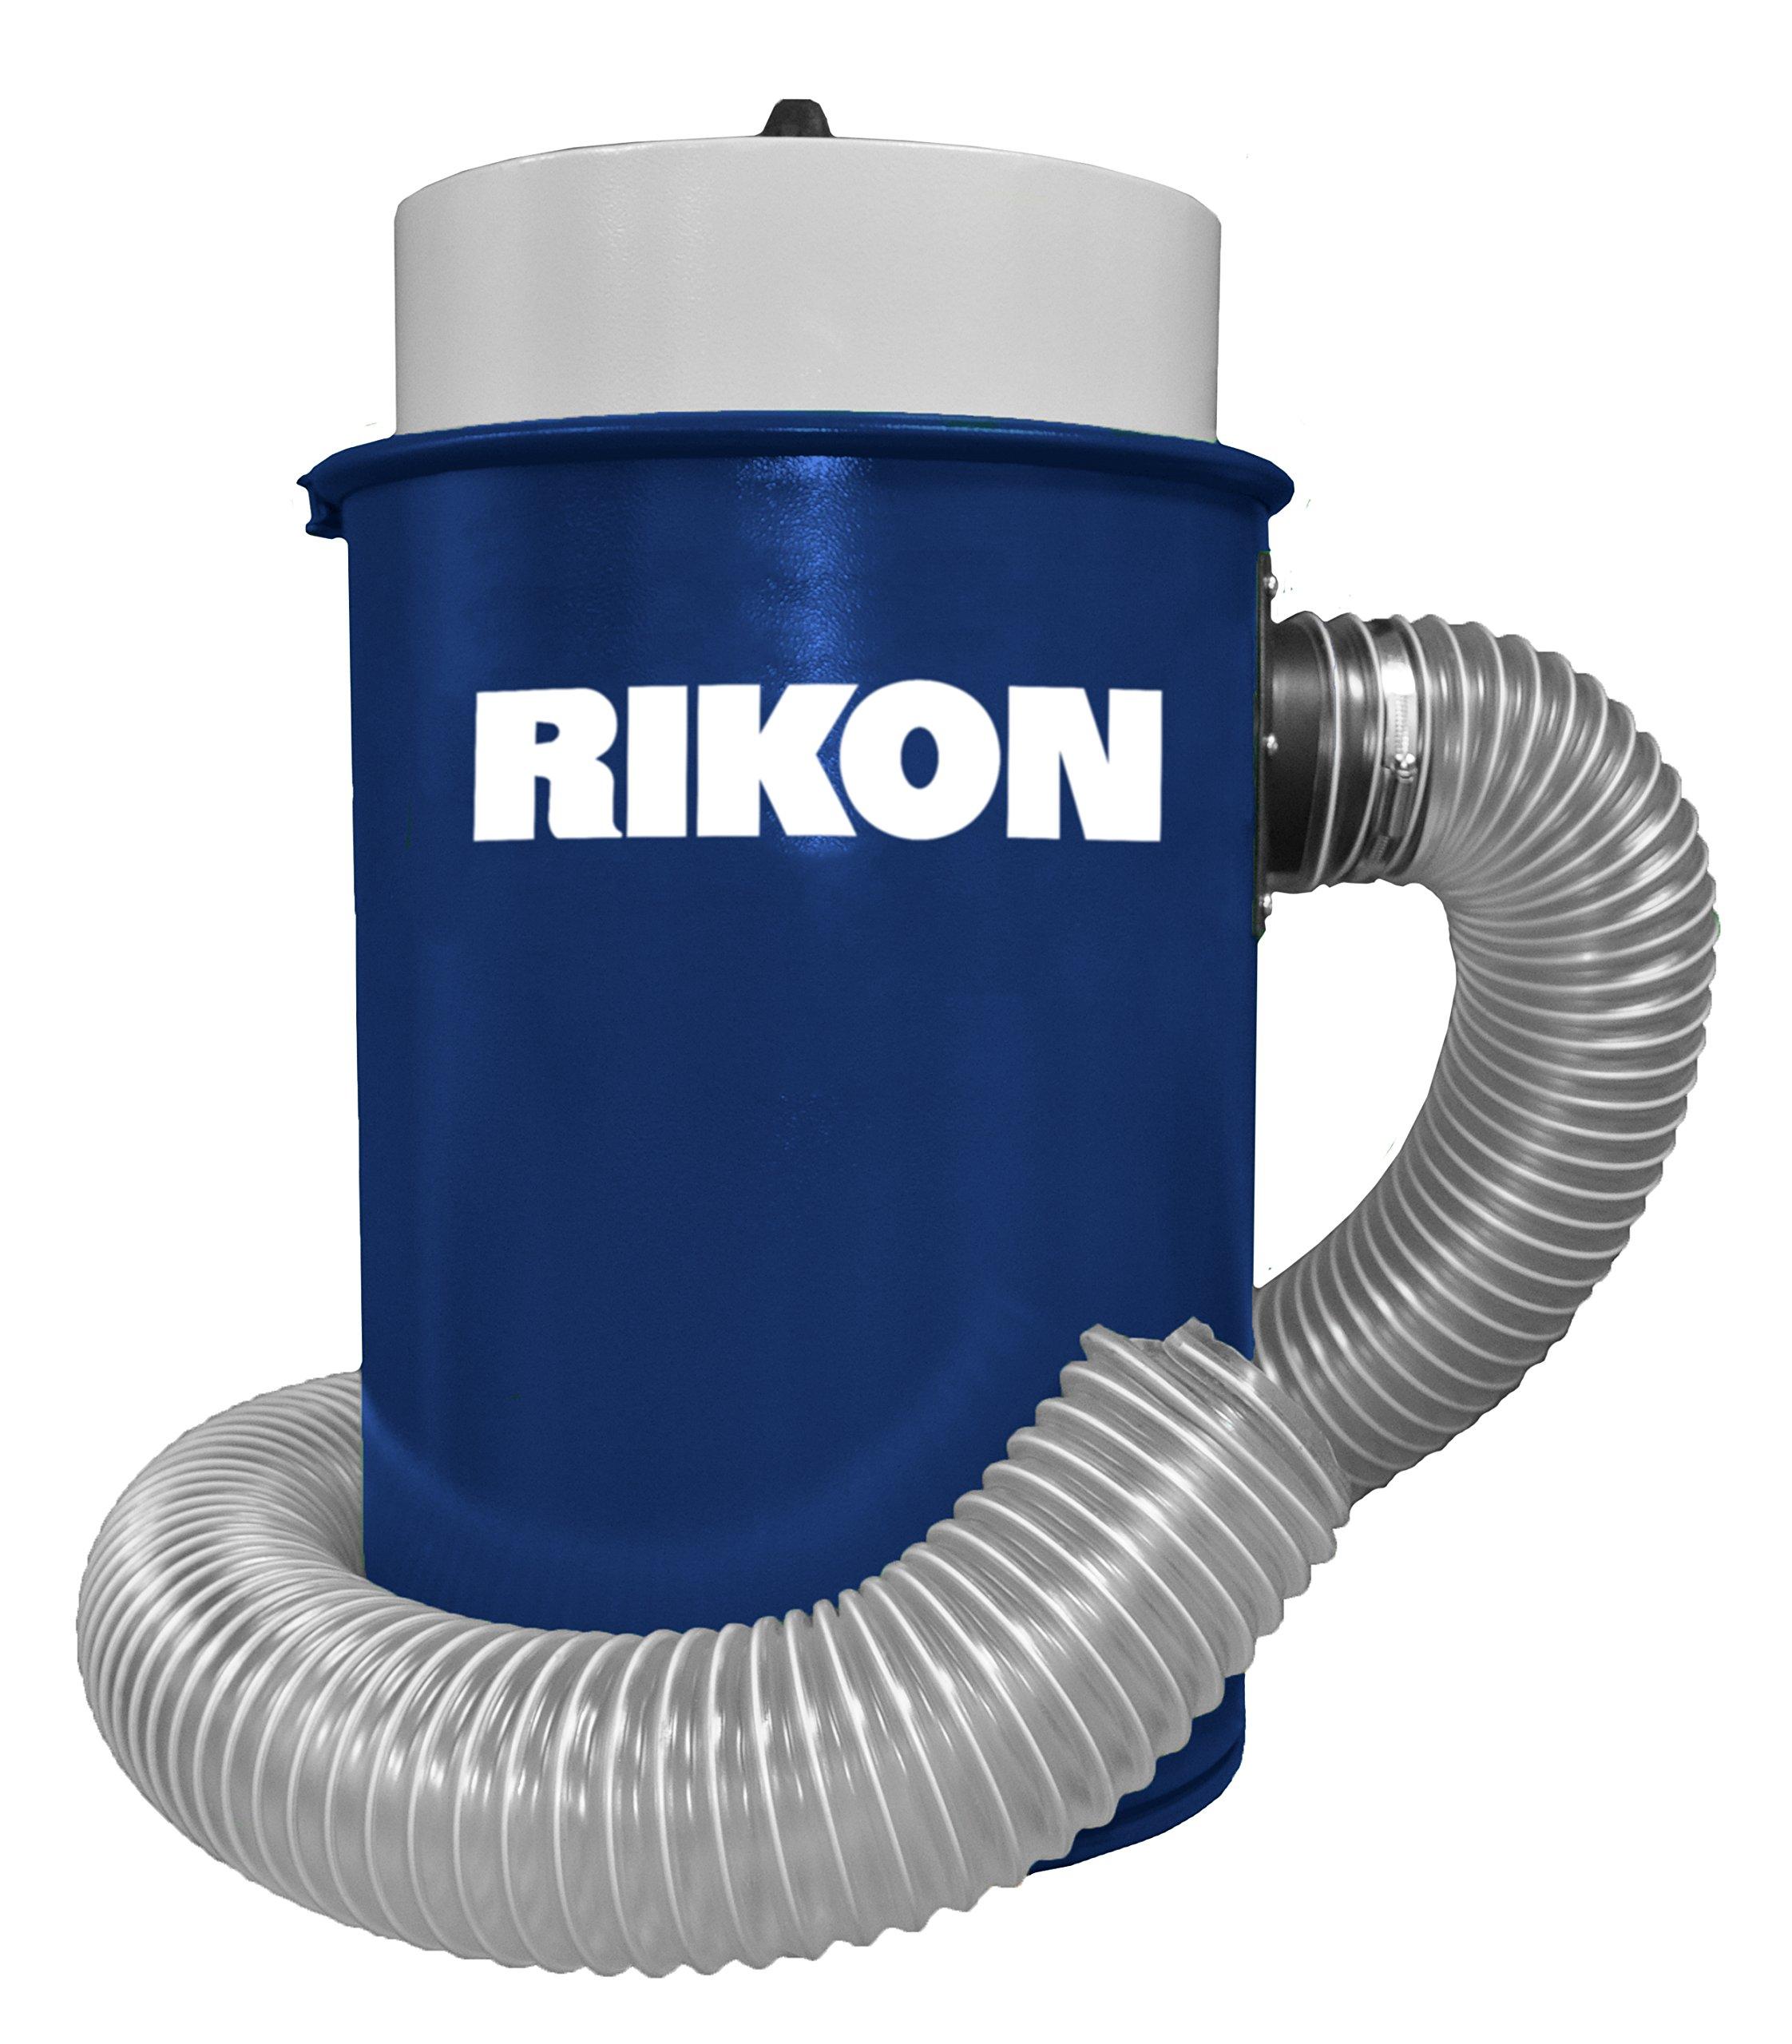 Rikon 63-100 Dust Extractor 12-Gallon Capacity